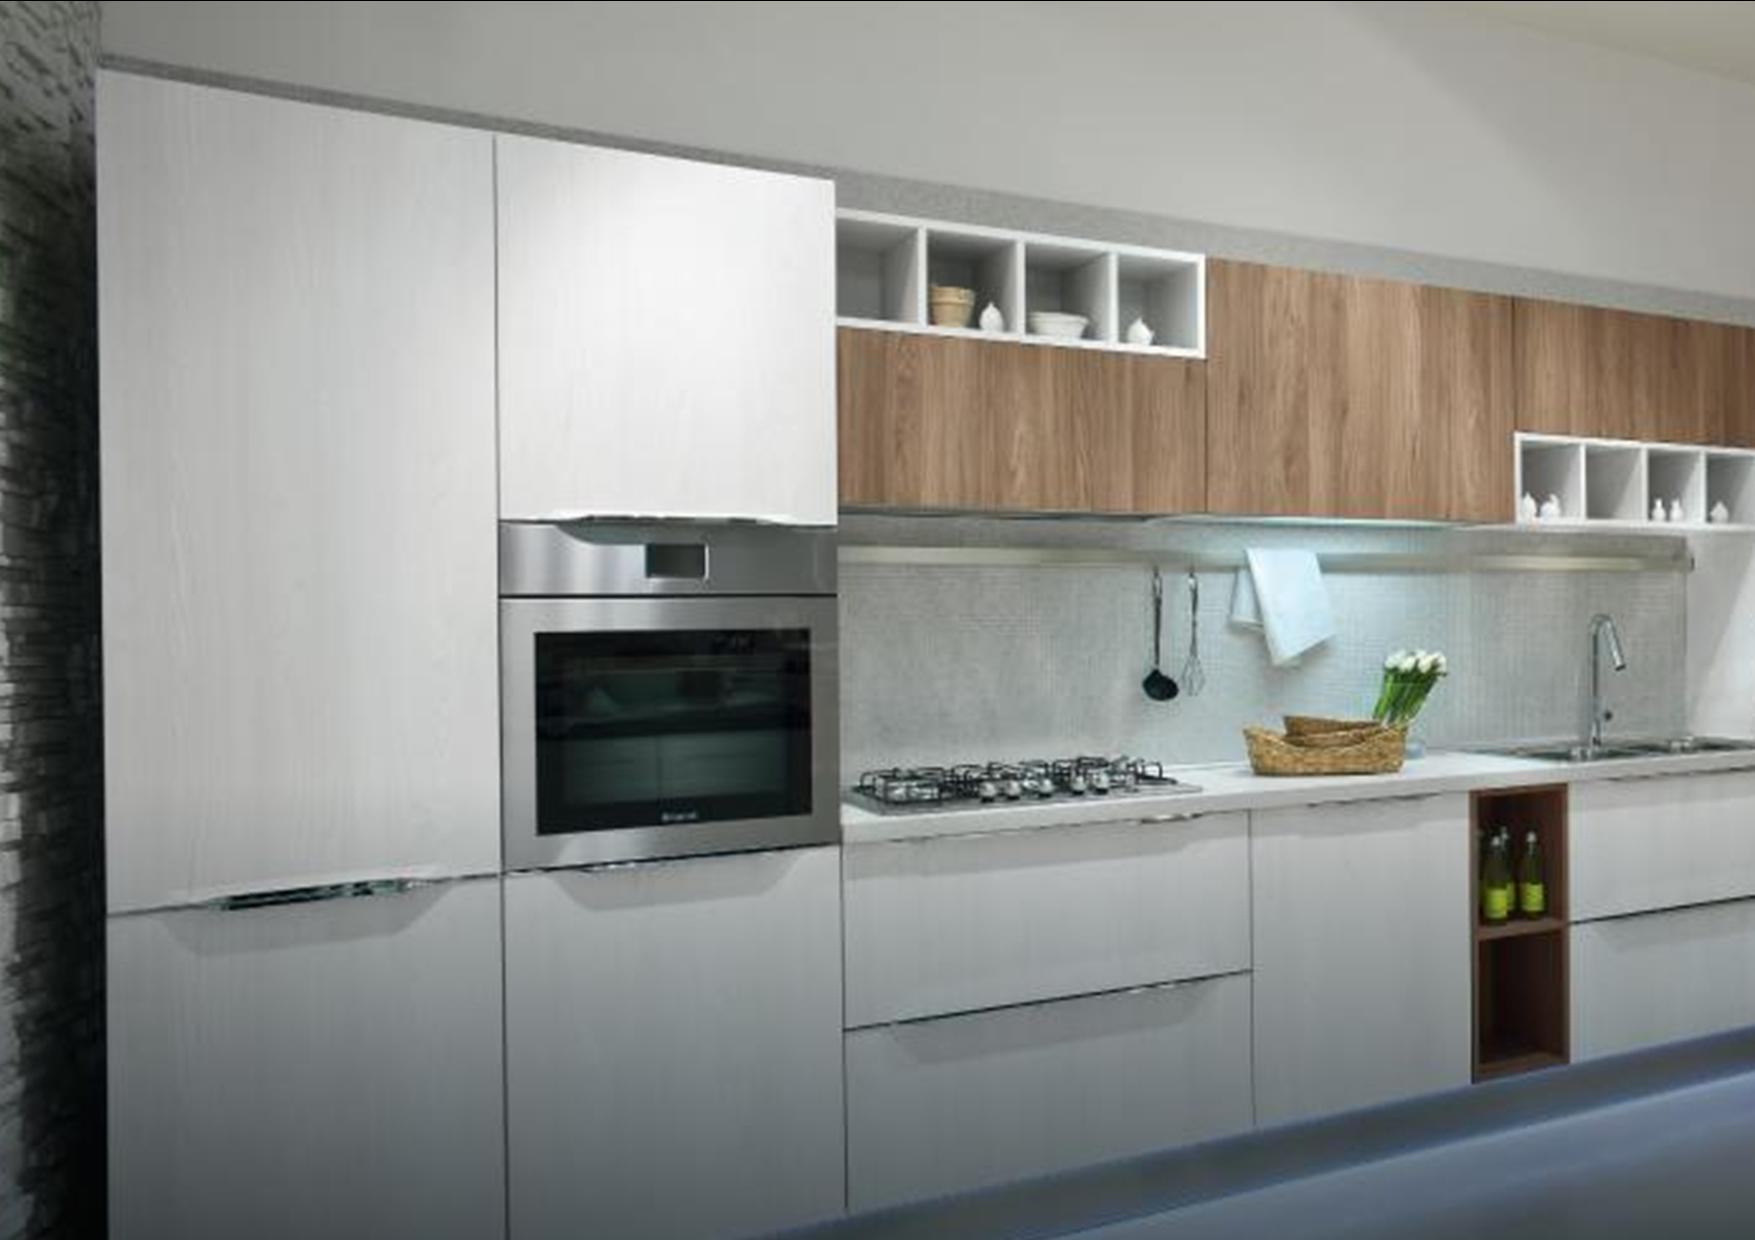 cucine bulthaup prezzo - 28 images - stunning cucine bulthaup prezzi ...